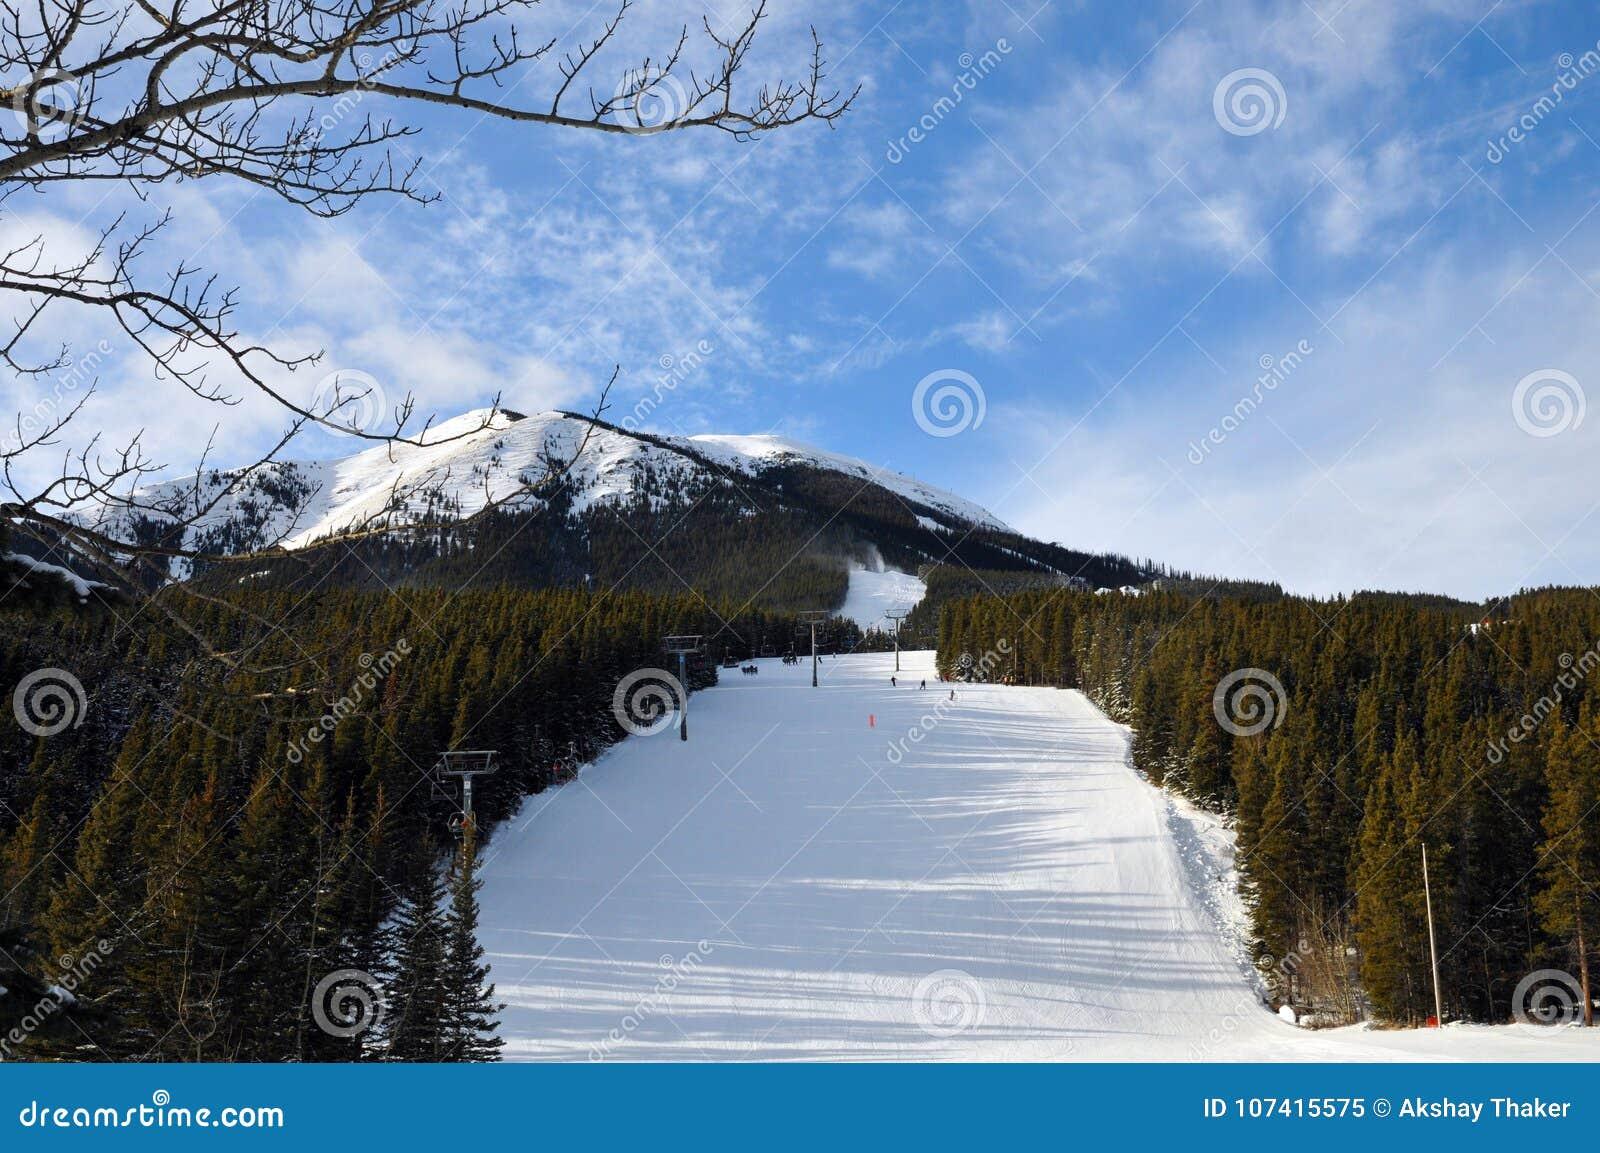 skiing slopes in kananaskis country, alberta, canada stock image